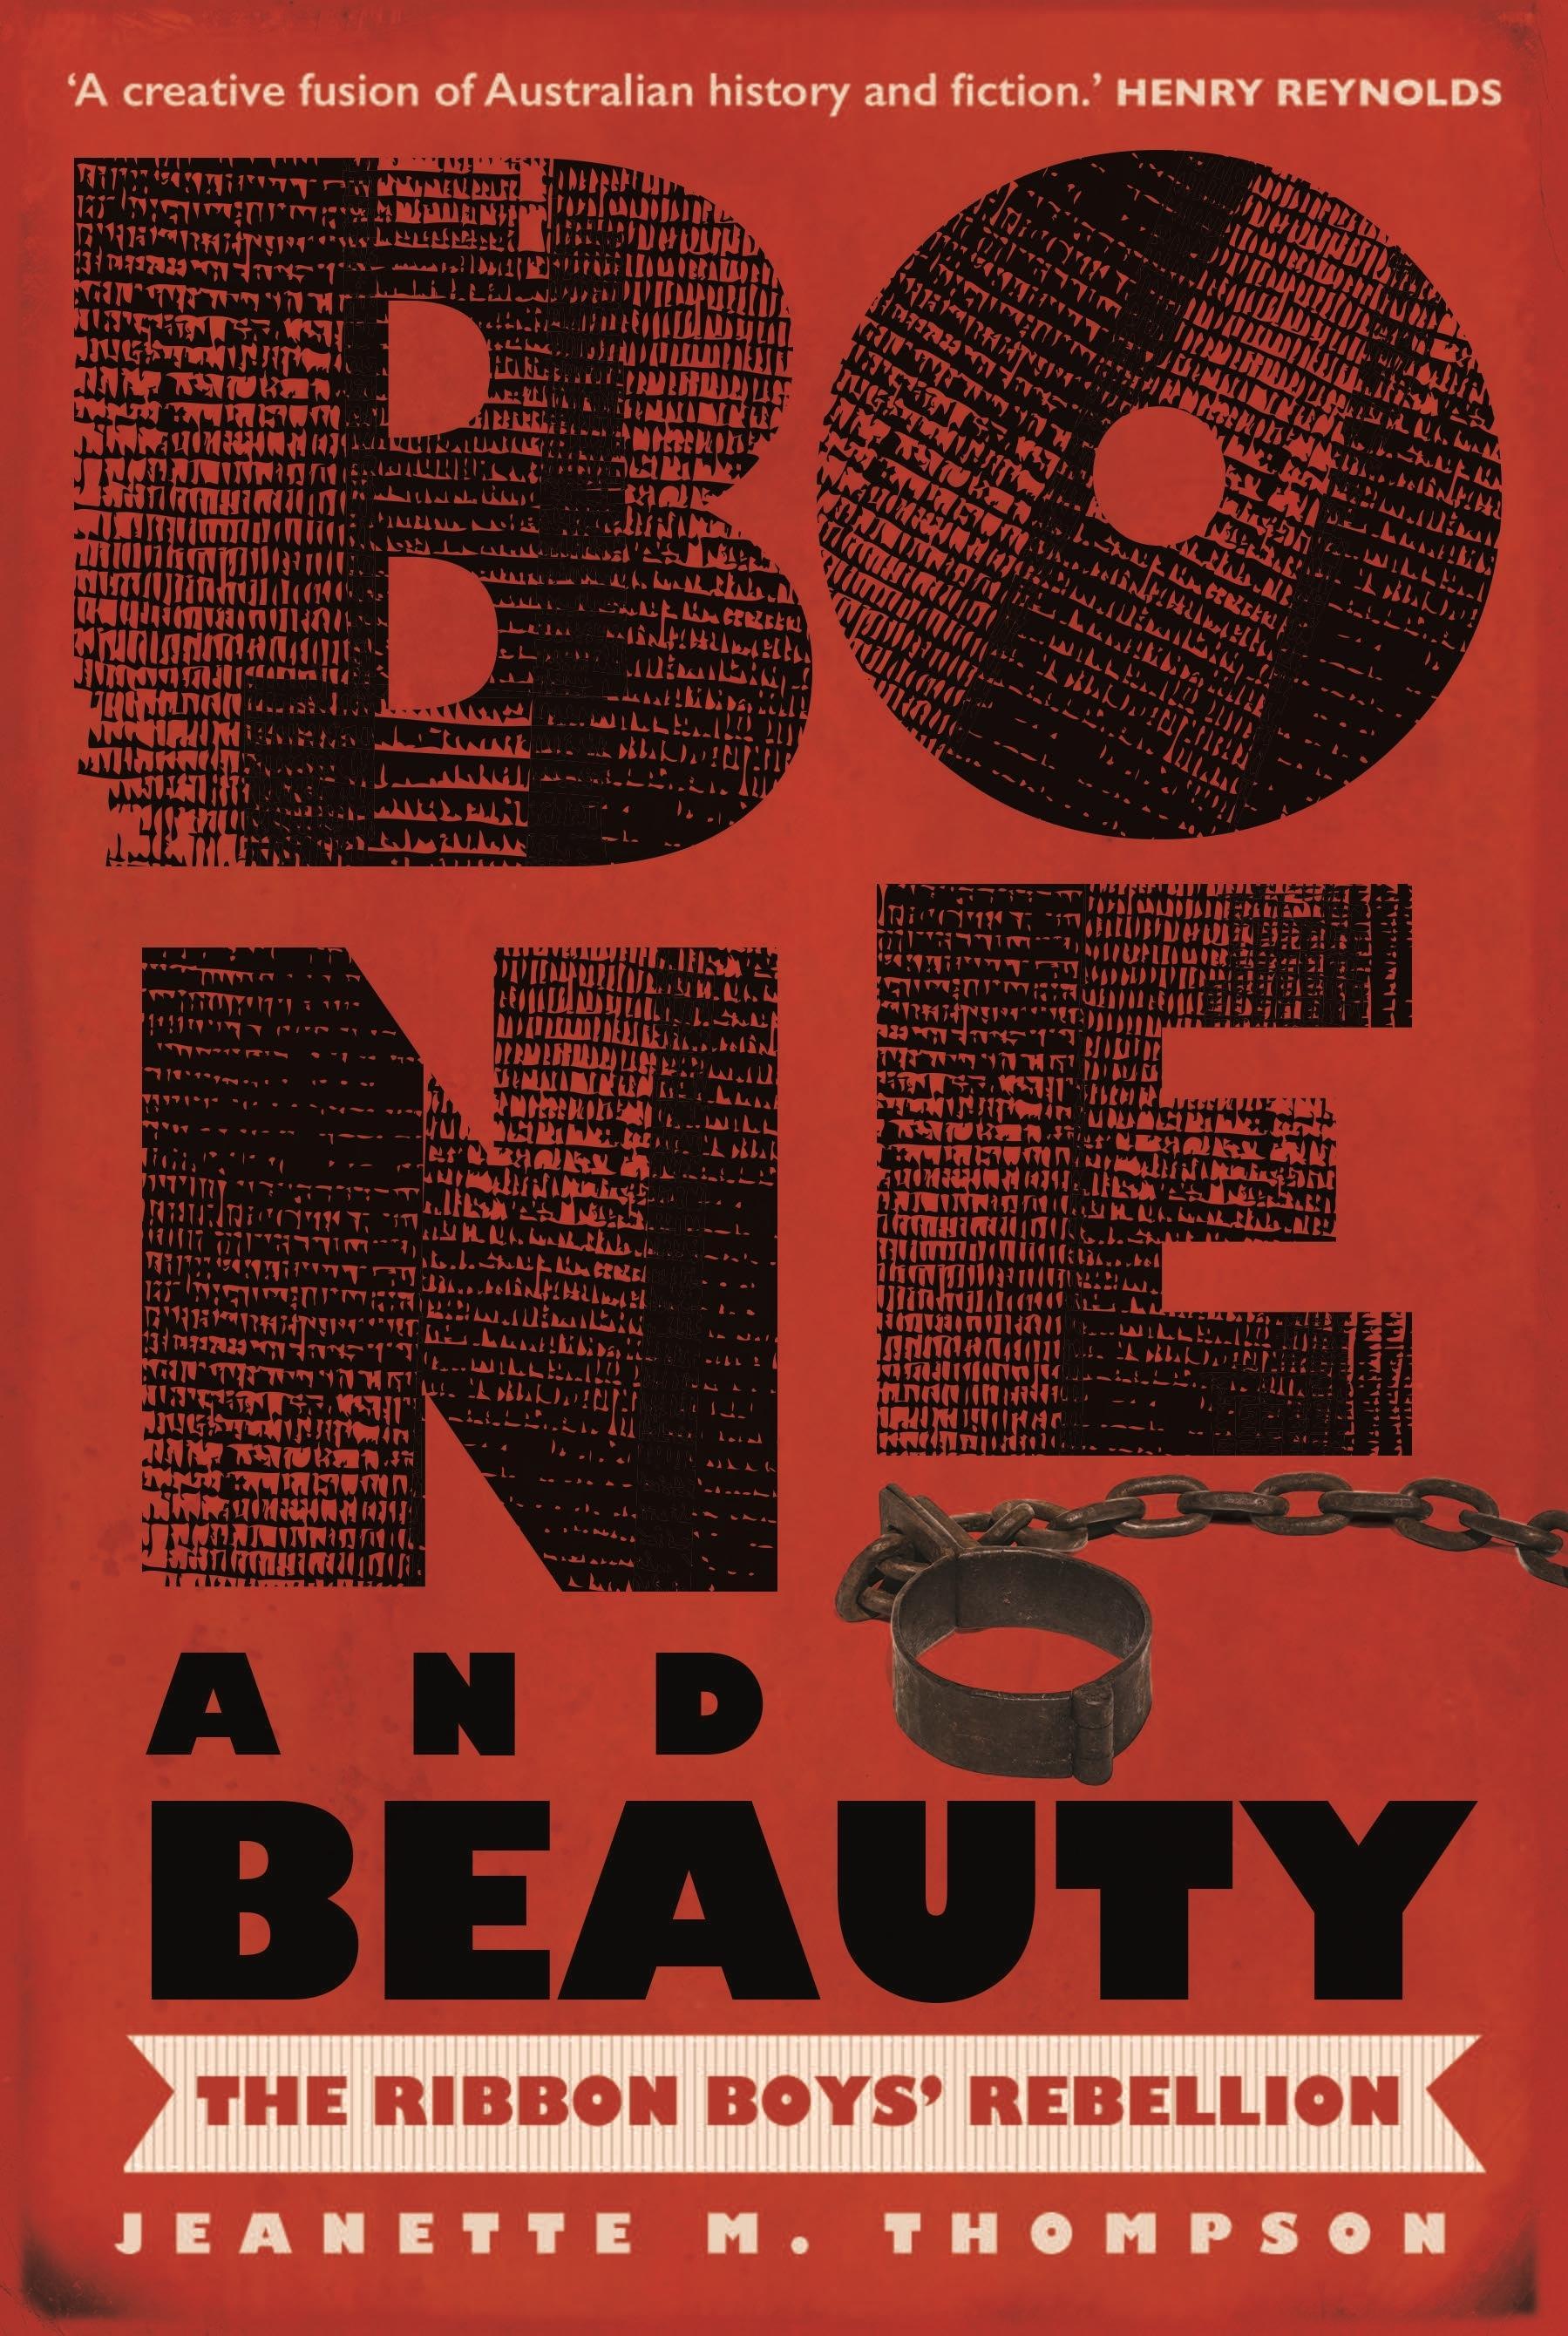 Bone and Beauty: The Ribbon Boys' Rebellionof1830